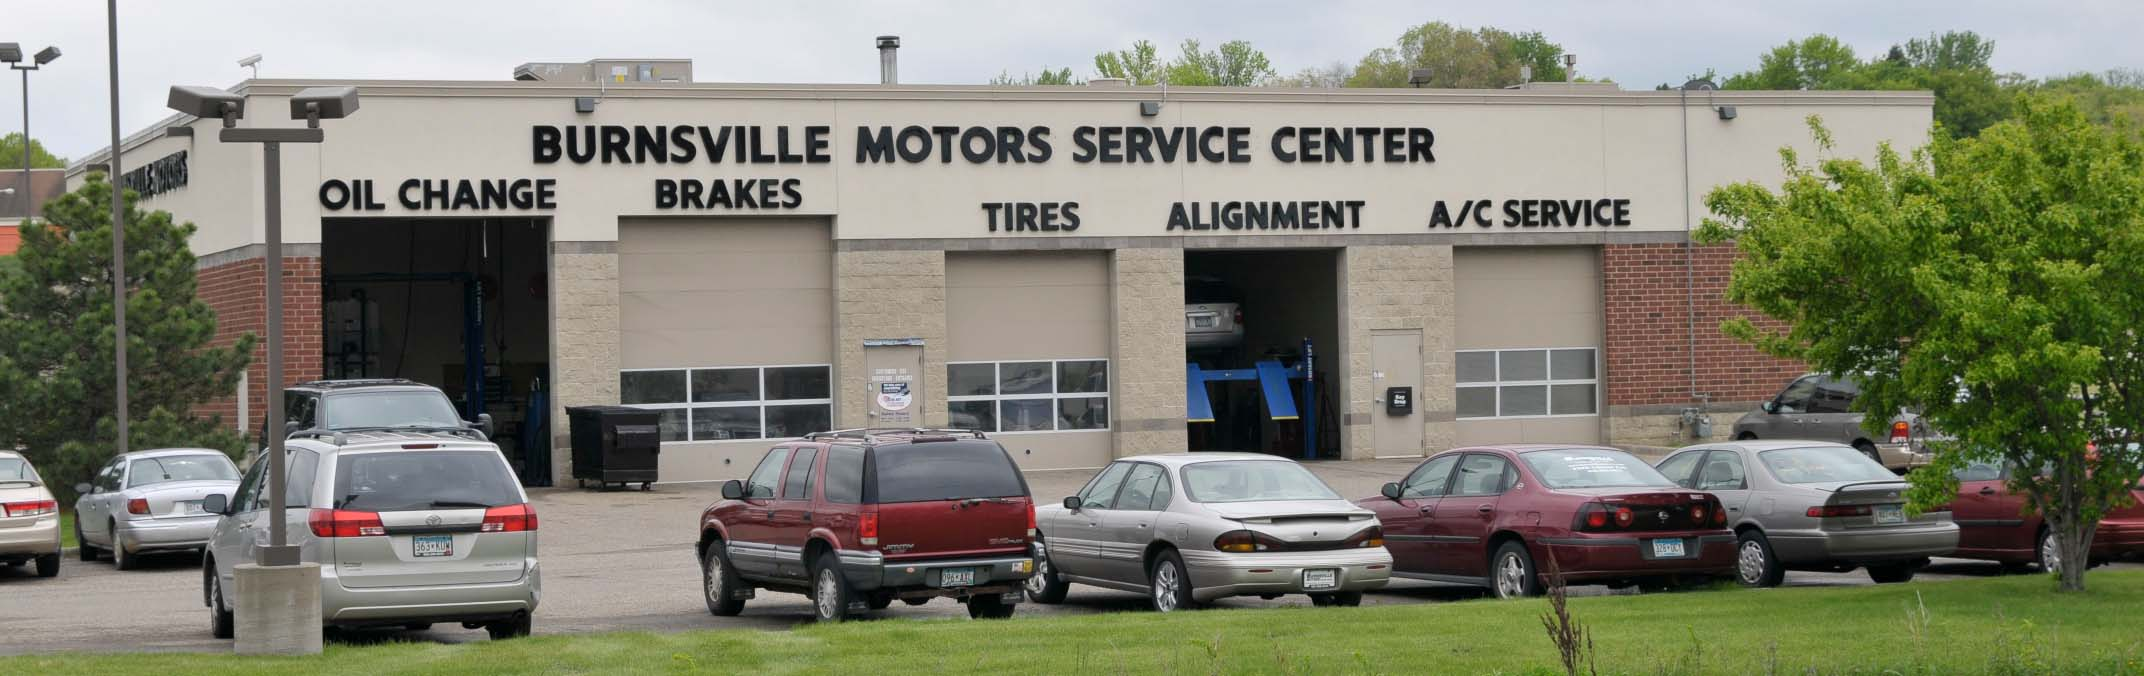 Service center at Burnsville Motors